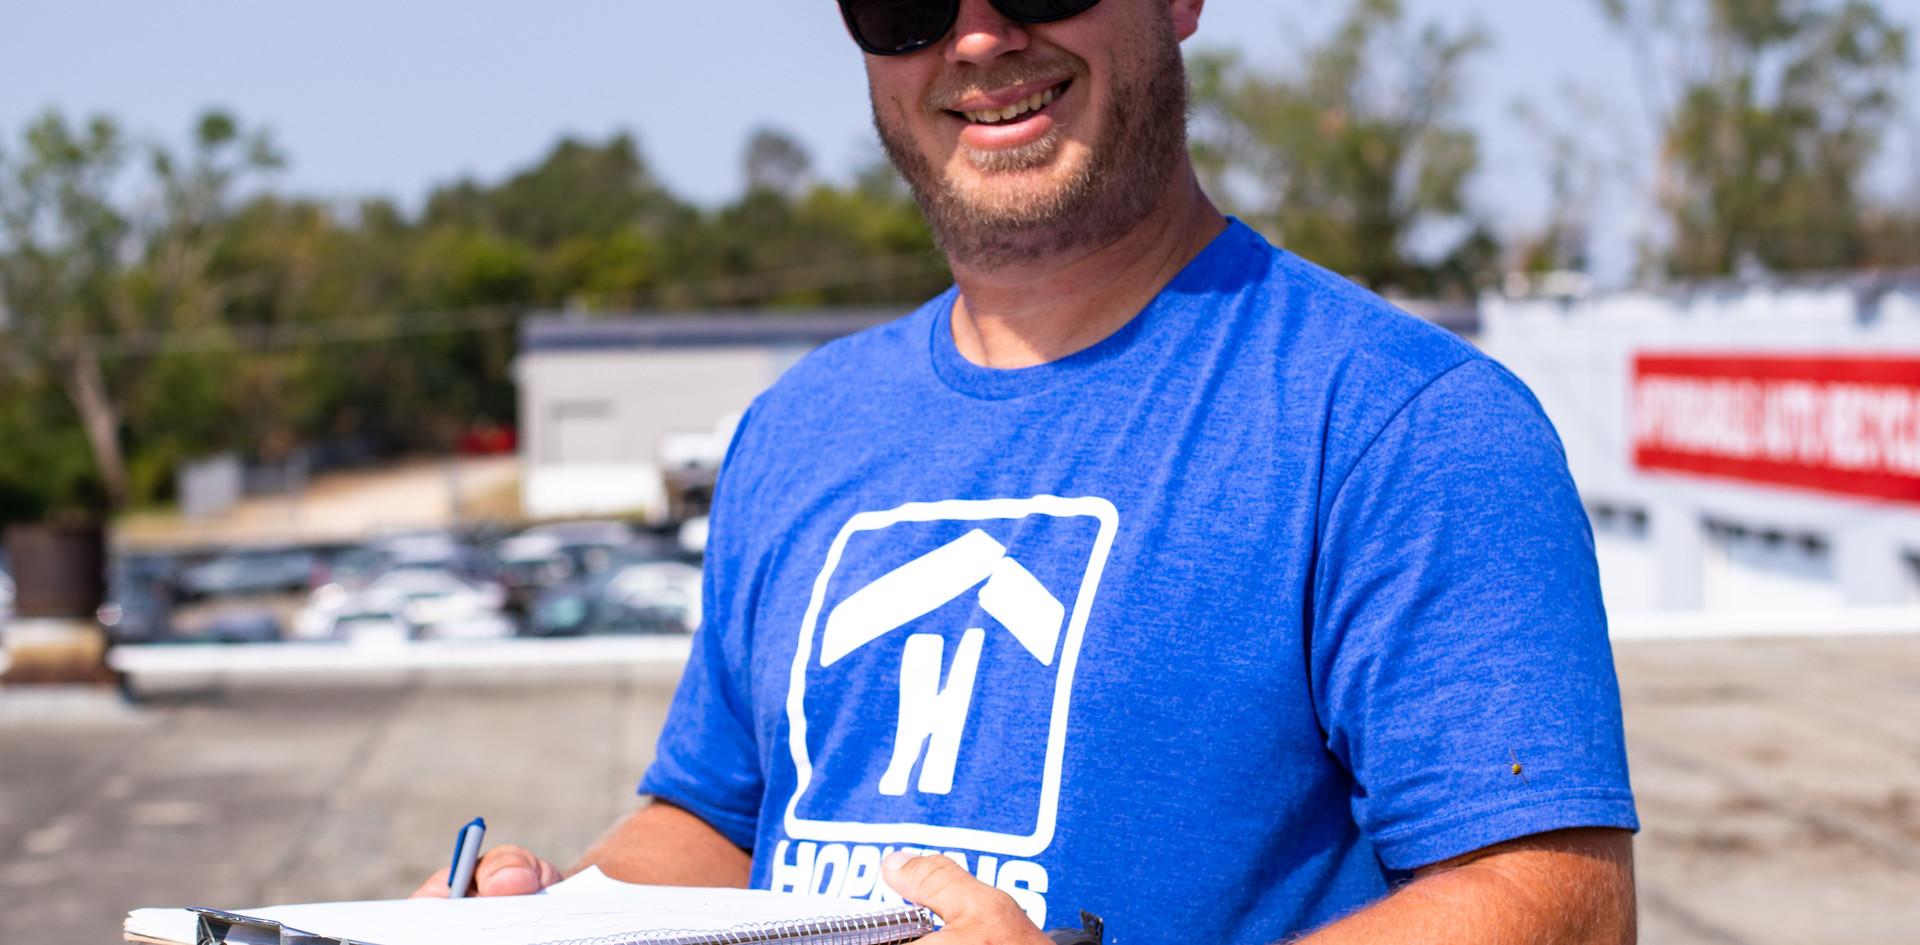 Tim-Hopkins-Roofing-Crews